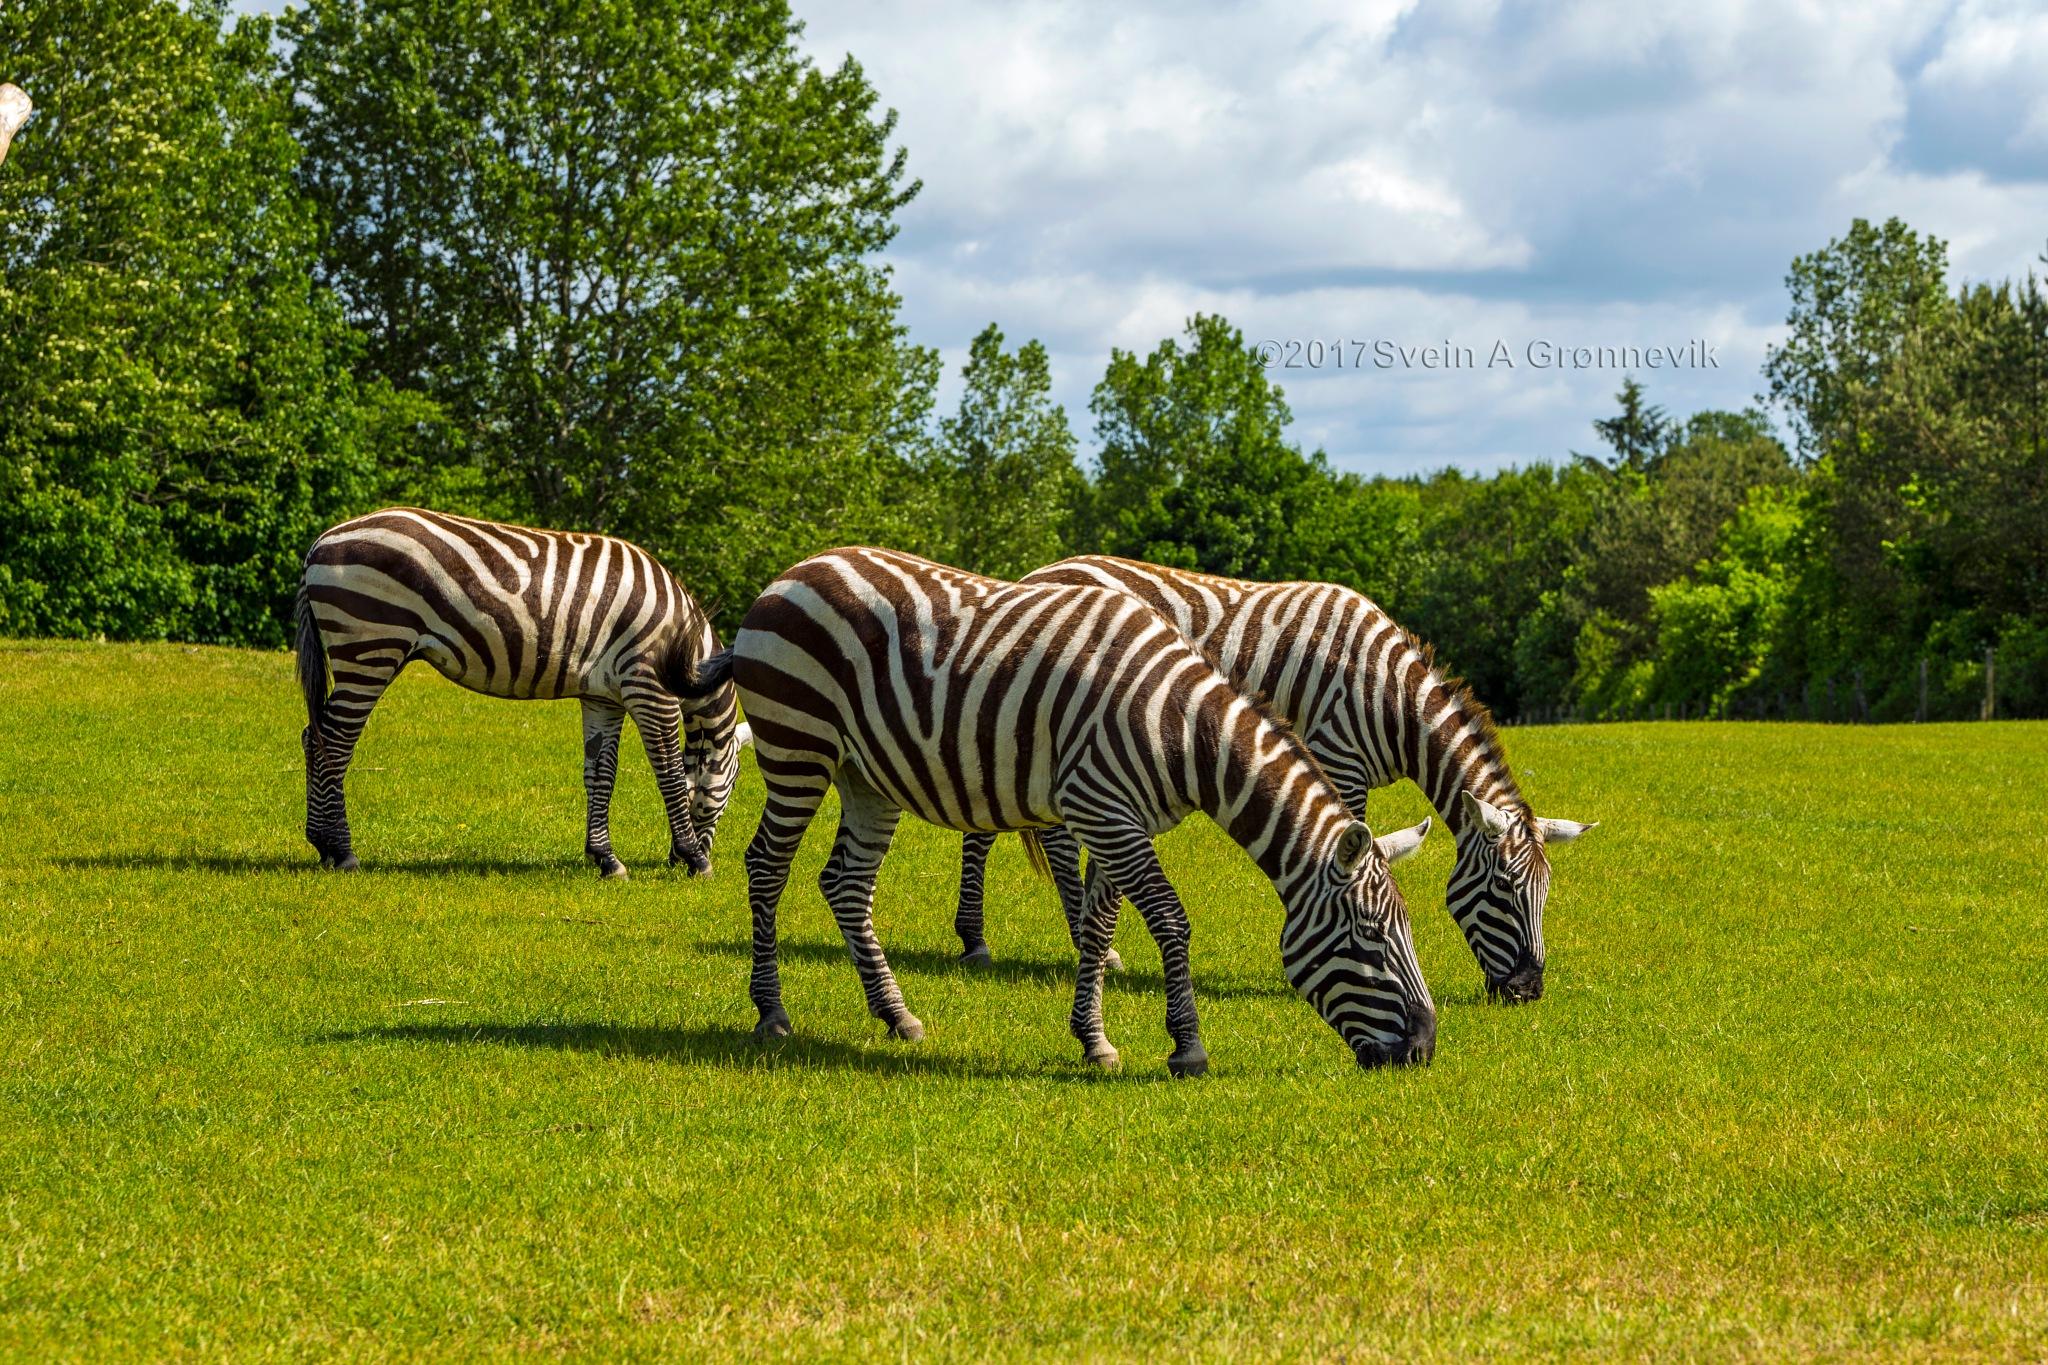 Zebra by Svein Arne Grønnevik